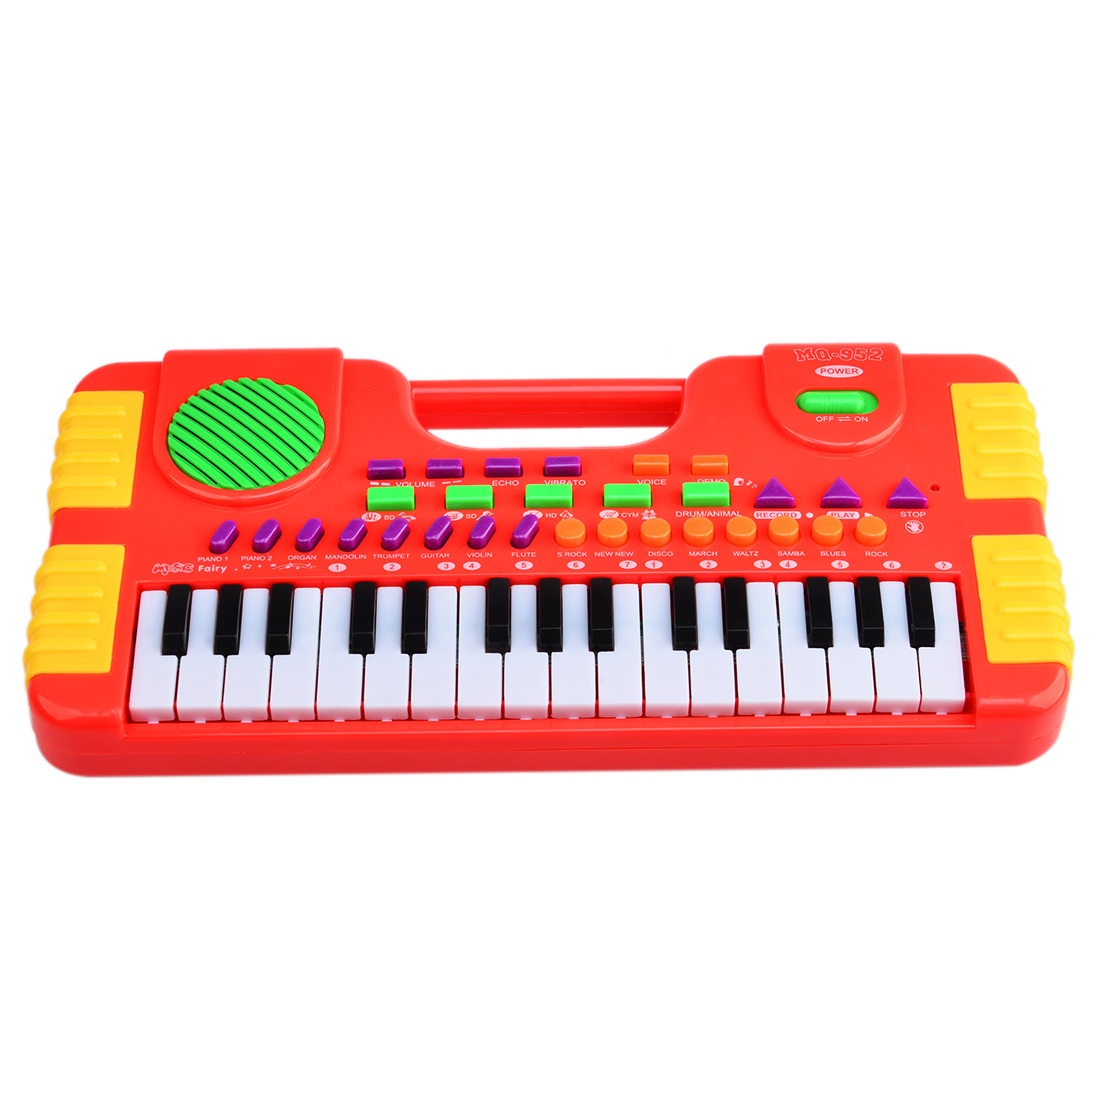 31 Keys Synthesizer Electronic Keyboard Piano Musical Toy